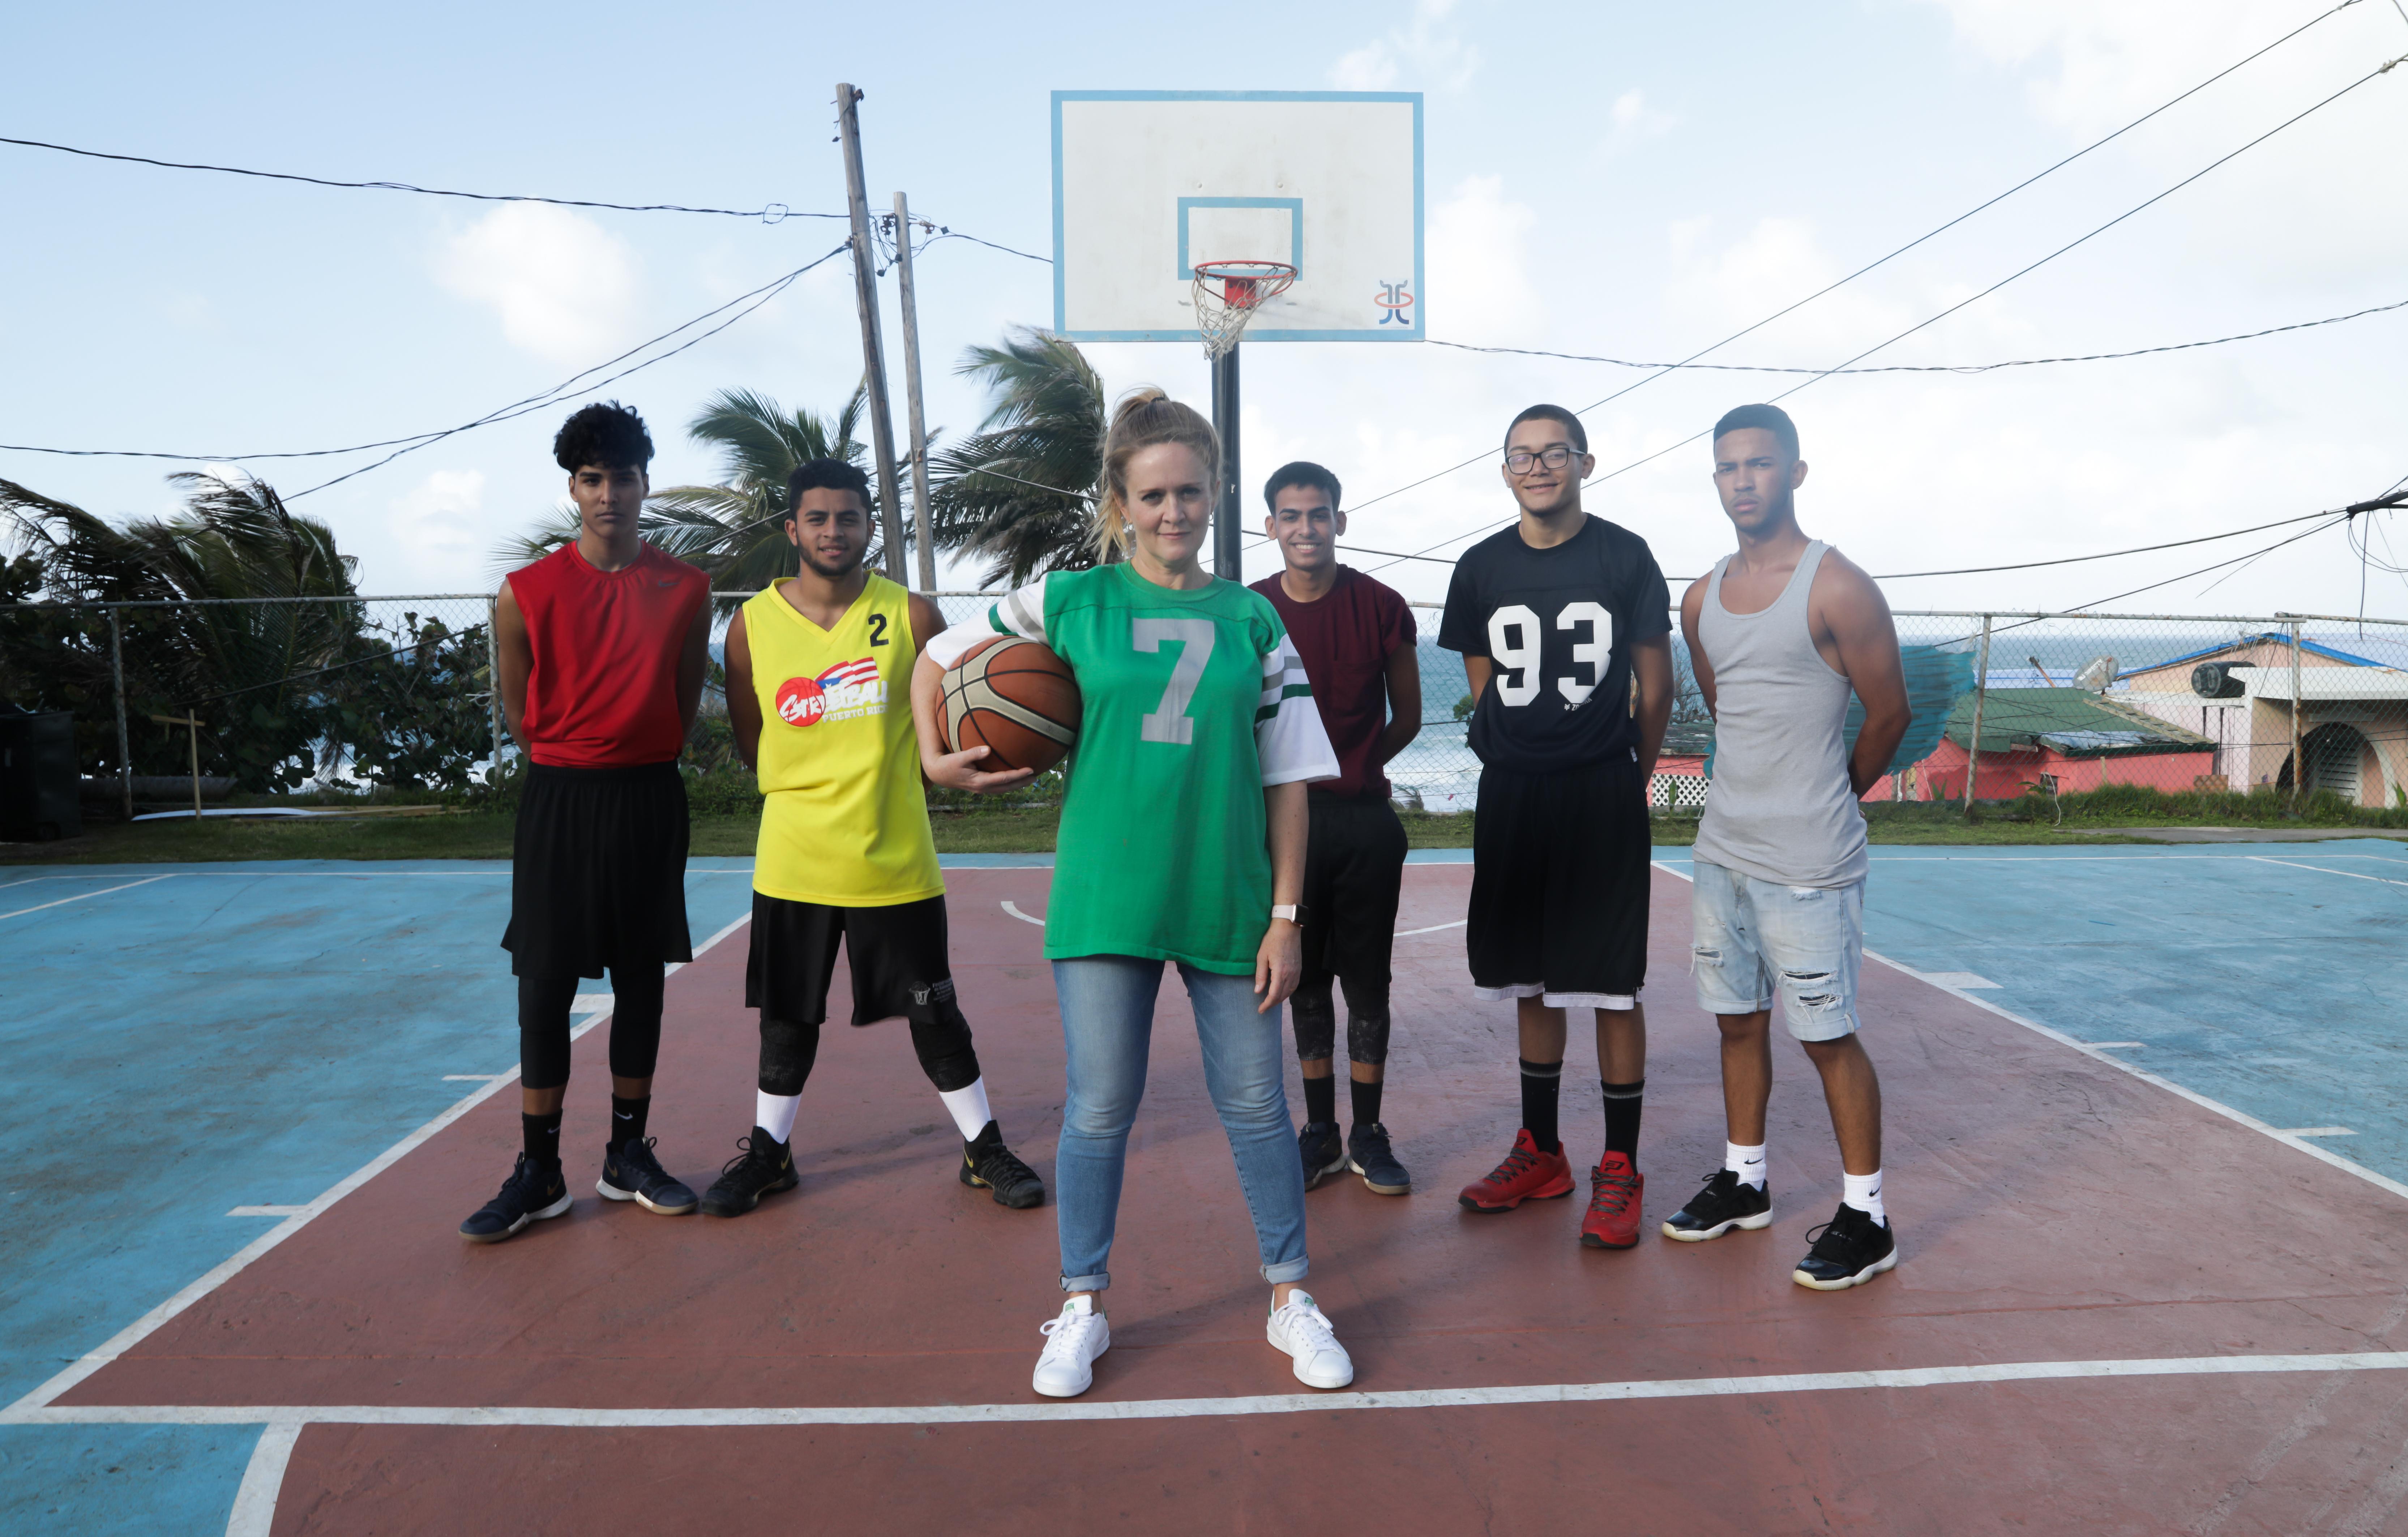 Samantha Bee Moves 'Full Frontal' Charitable T-Shirt Production to Puerto Rico